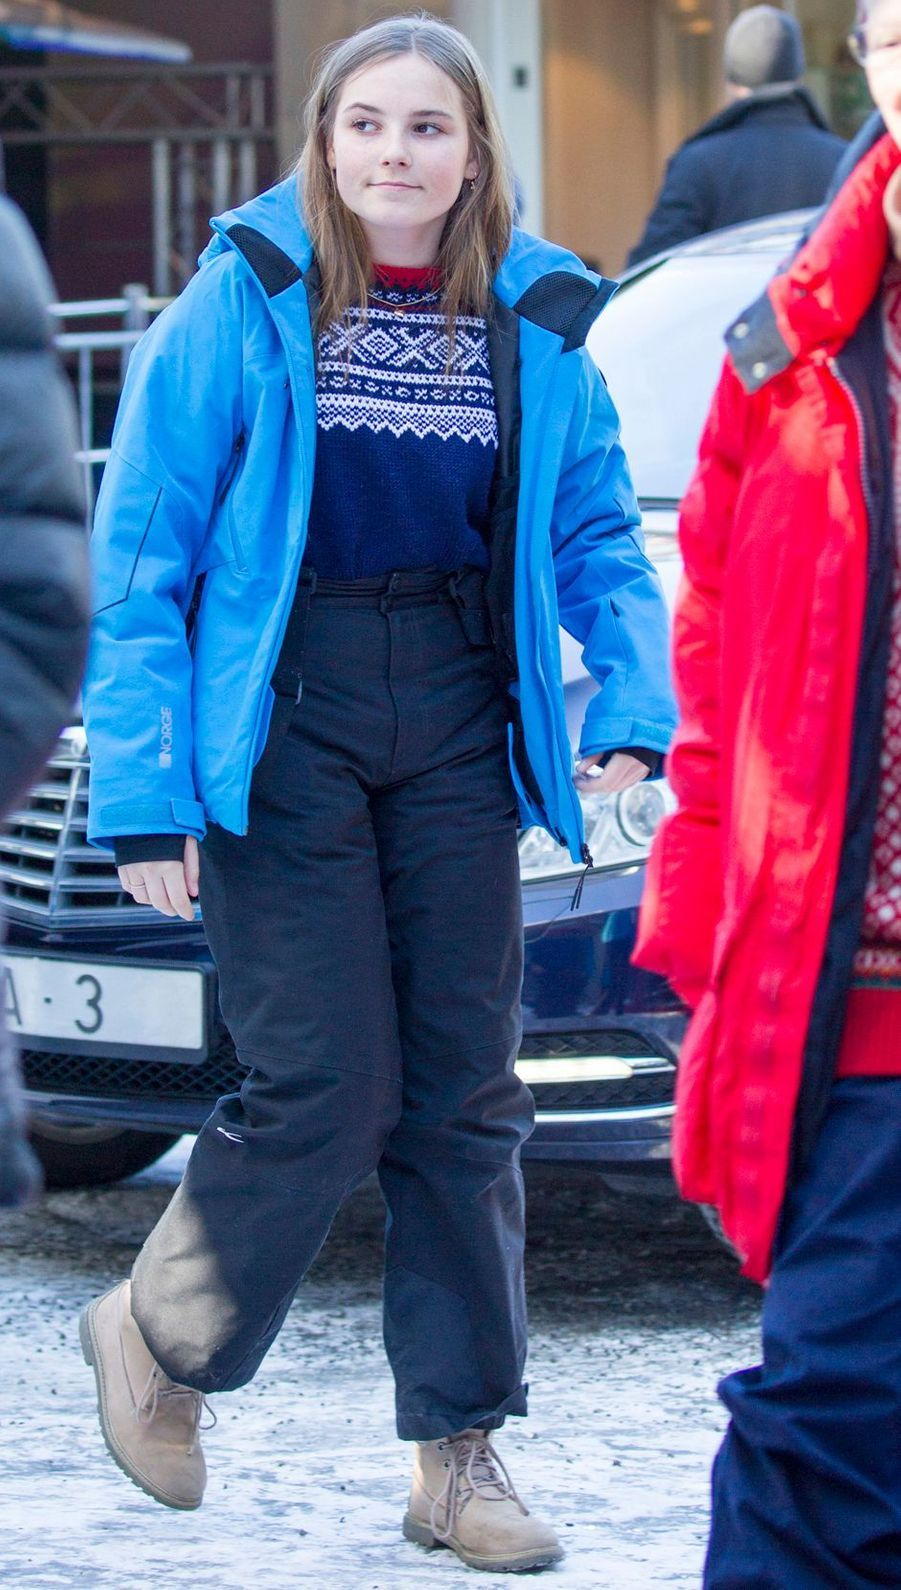 La princesse Ingrid Alexandra de Norvège à Oslo, le 10 mars 2019